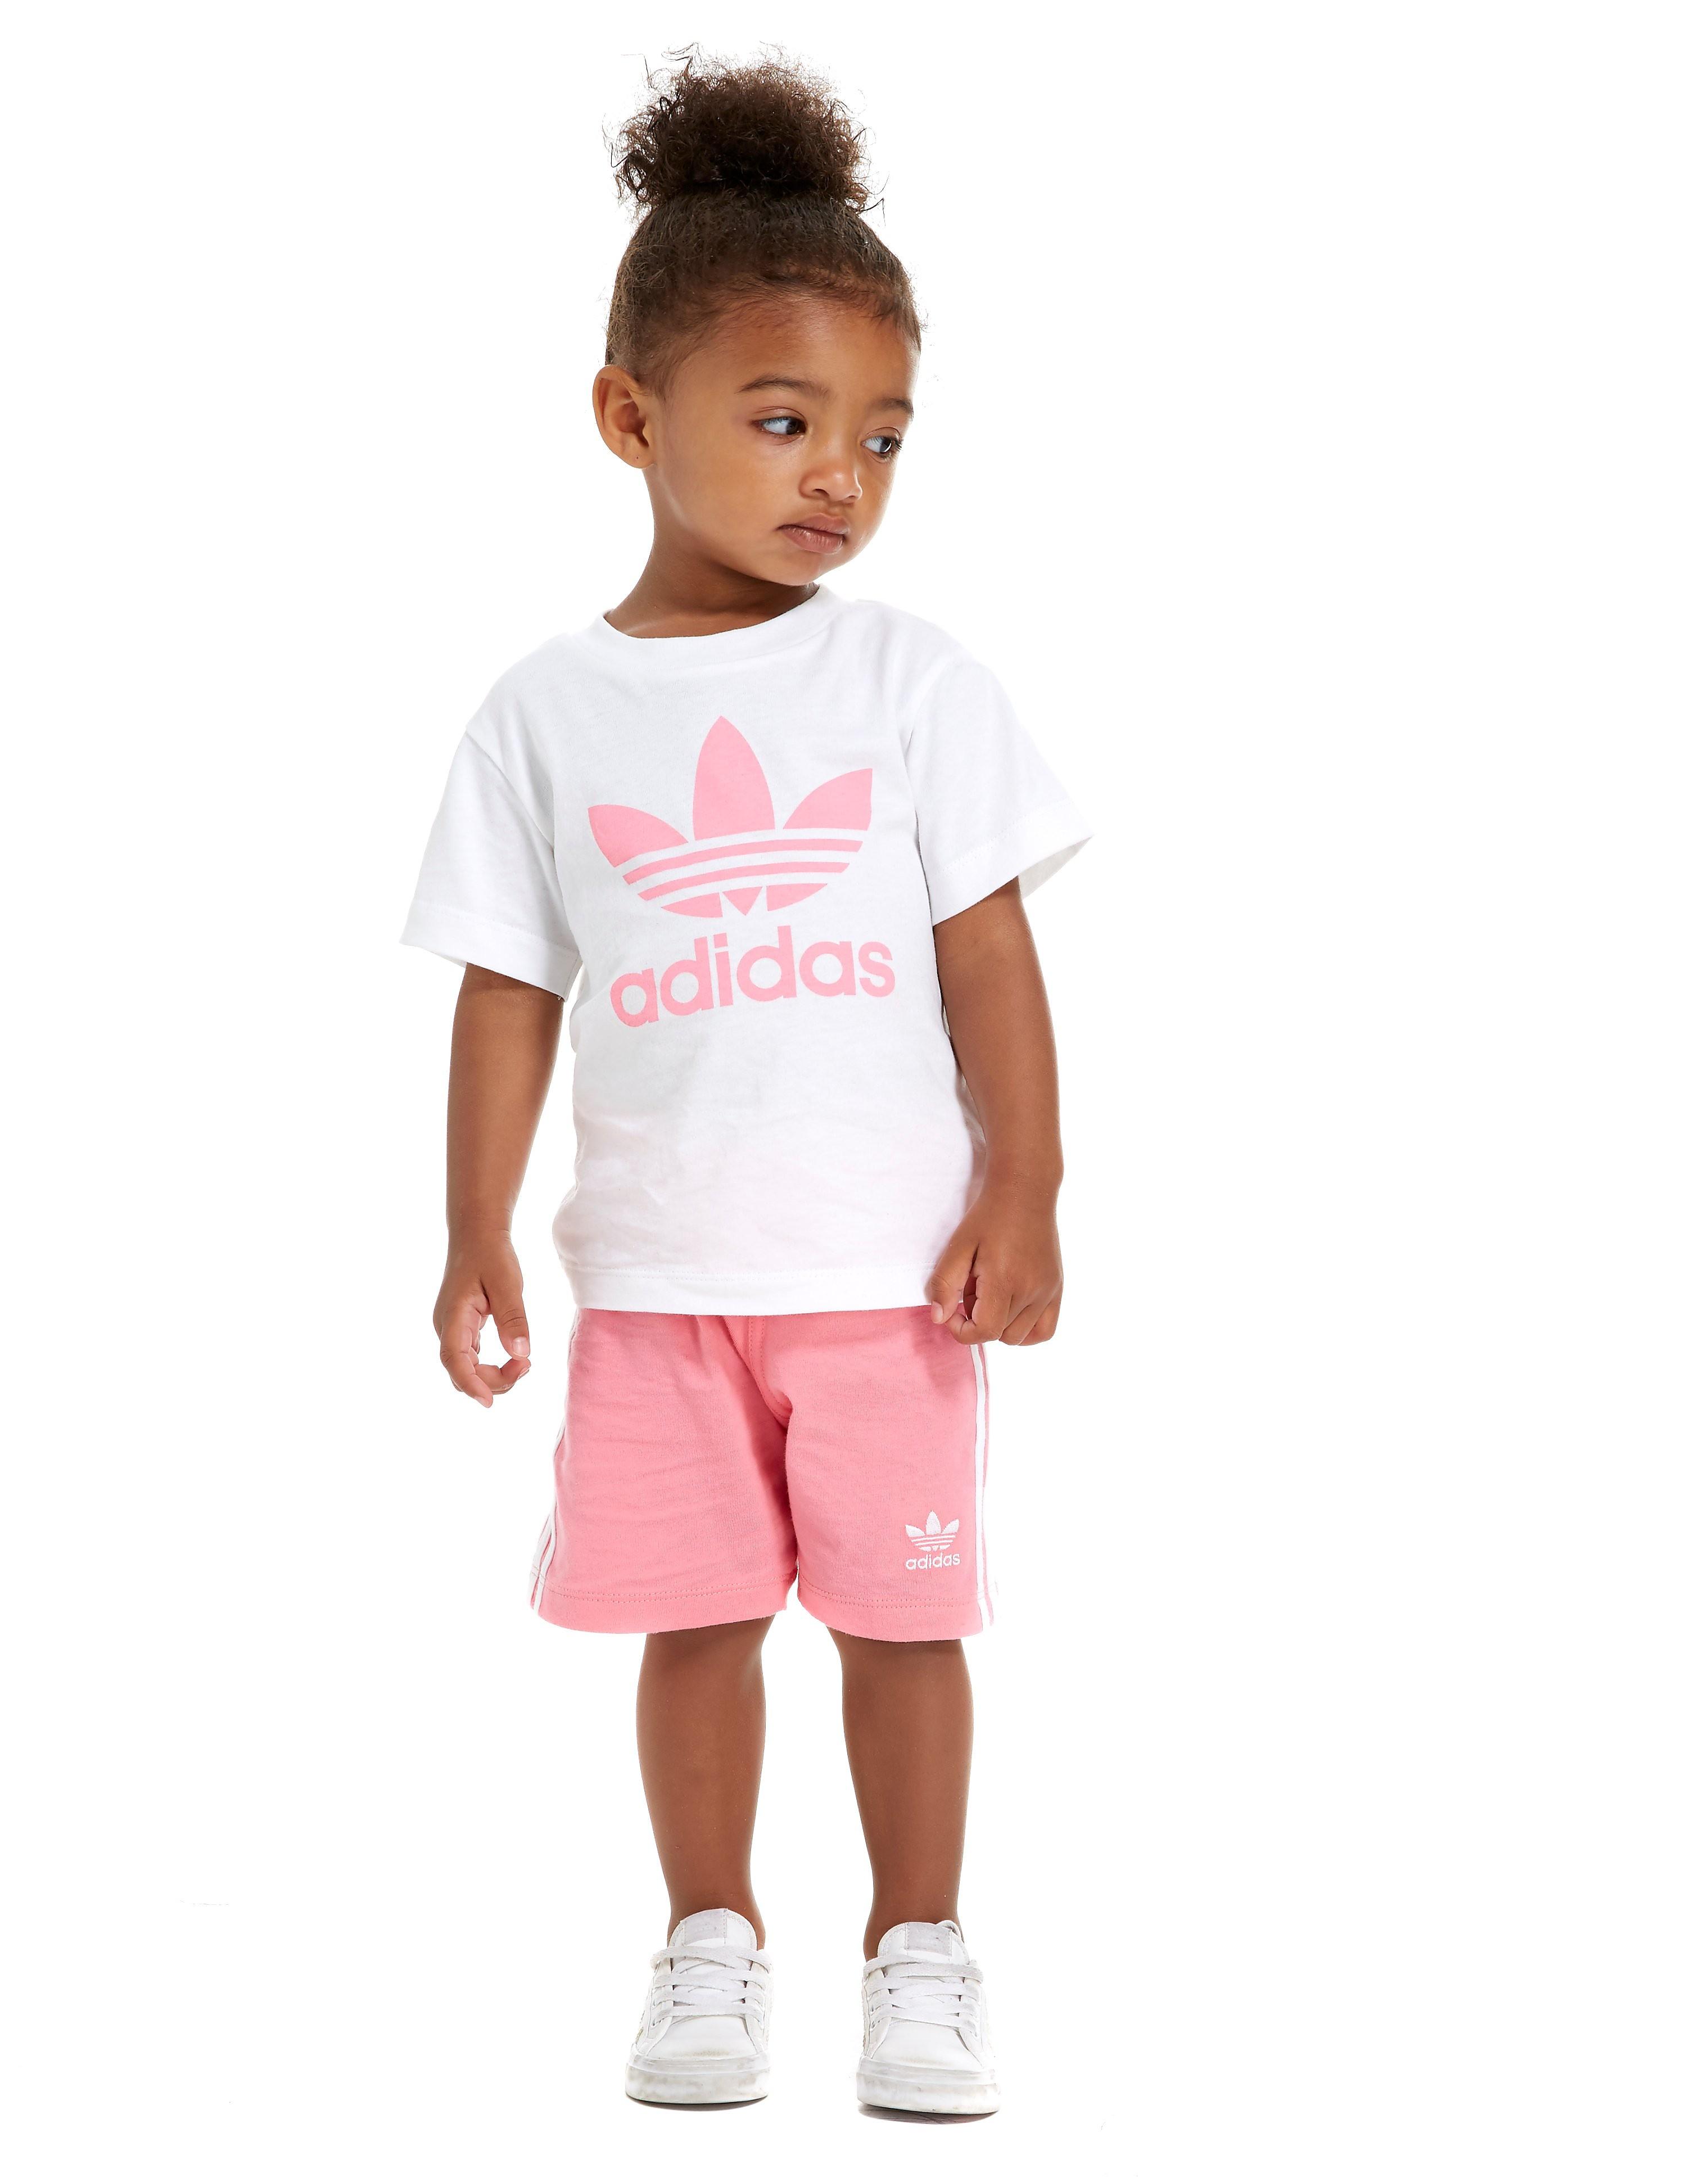 adidas Originals Girls' Trefoil T-Shirt and Short Set Infant